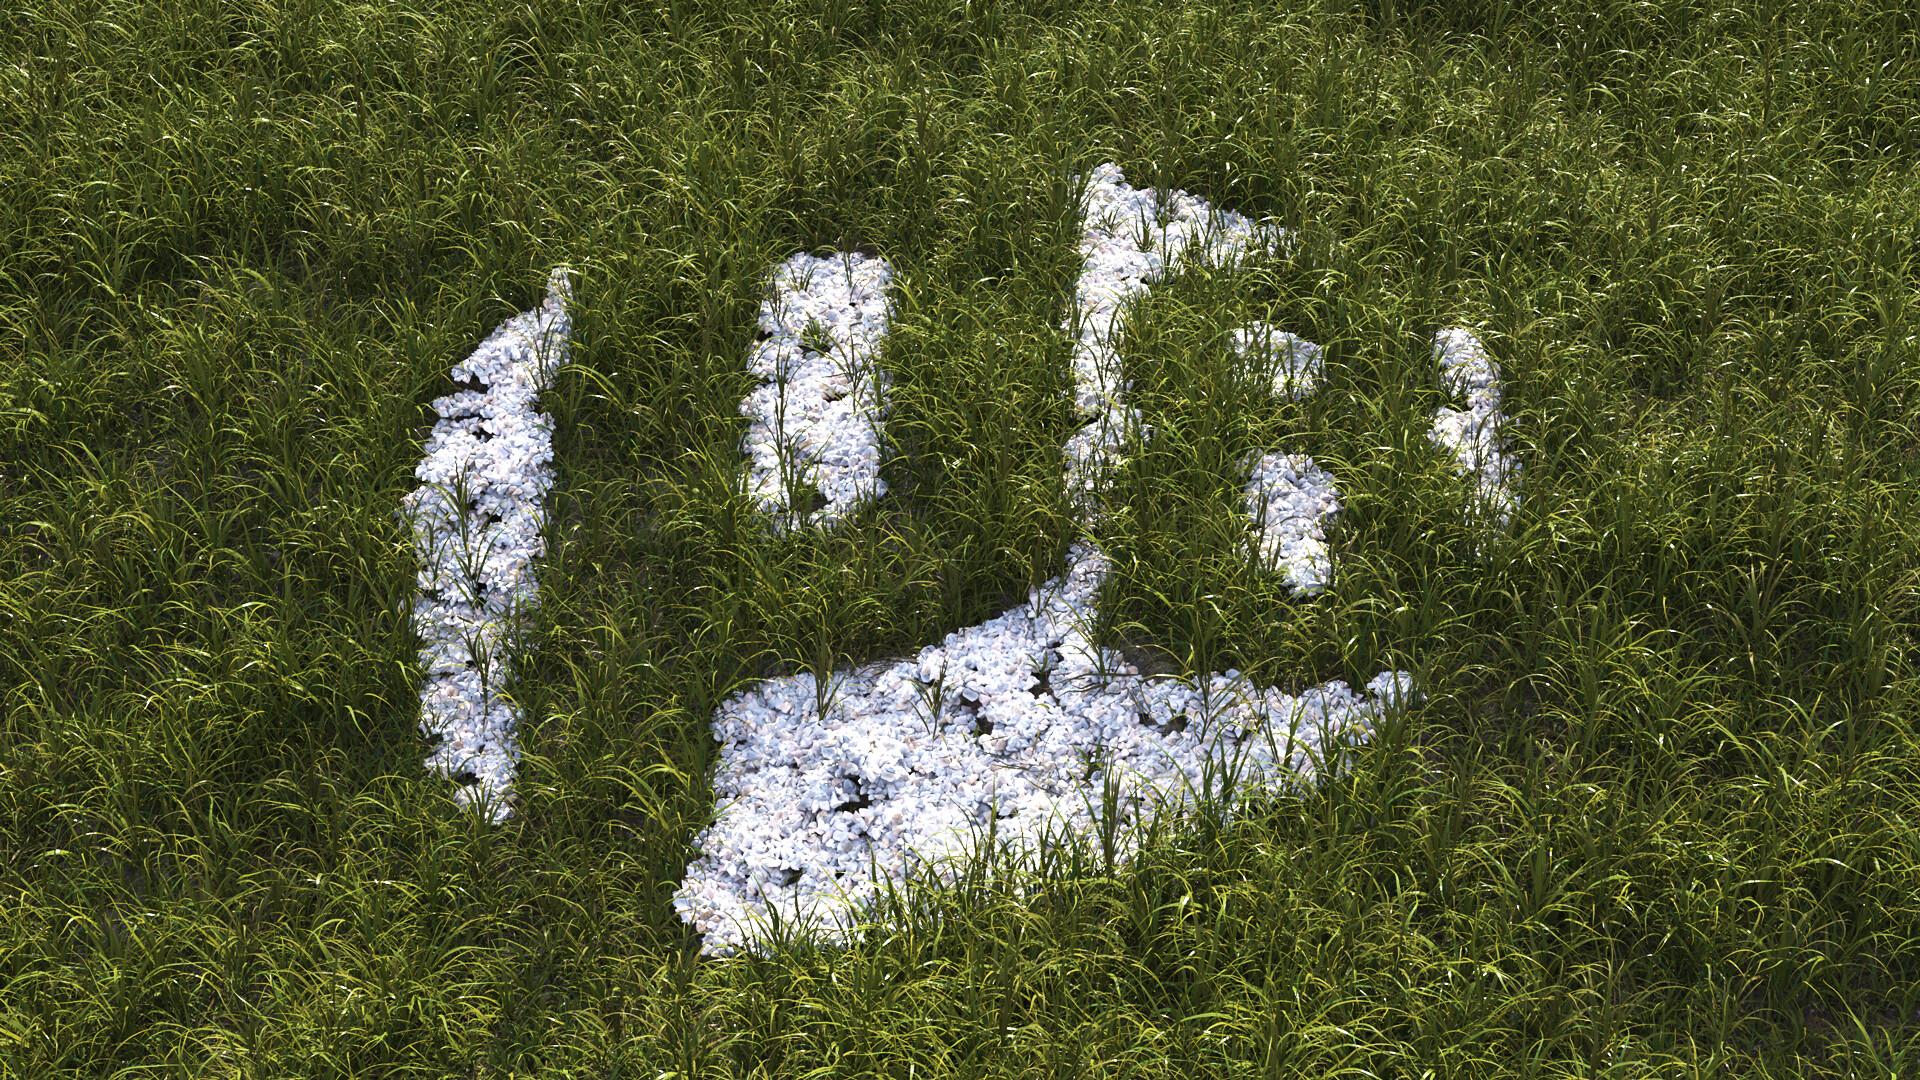 Logo n' grass !